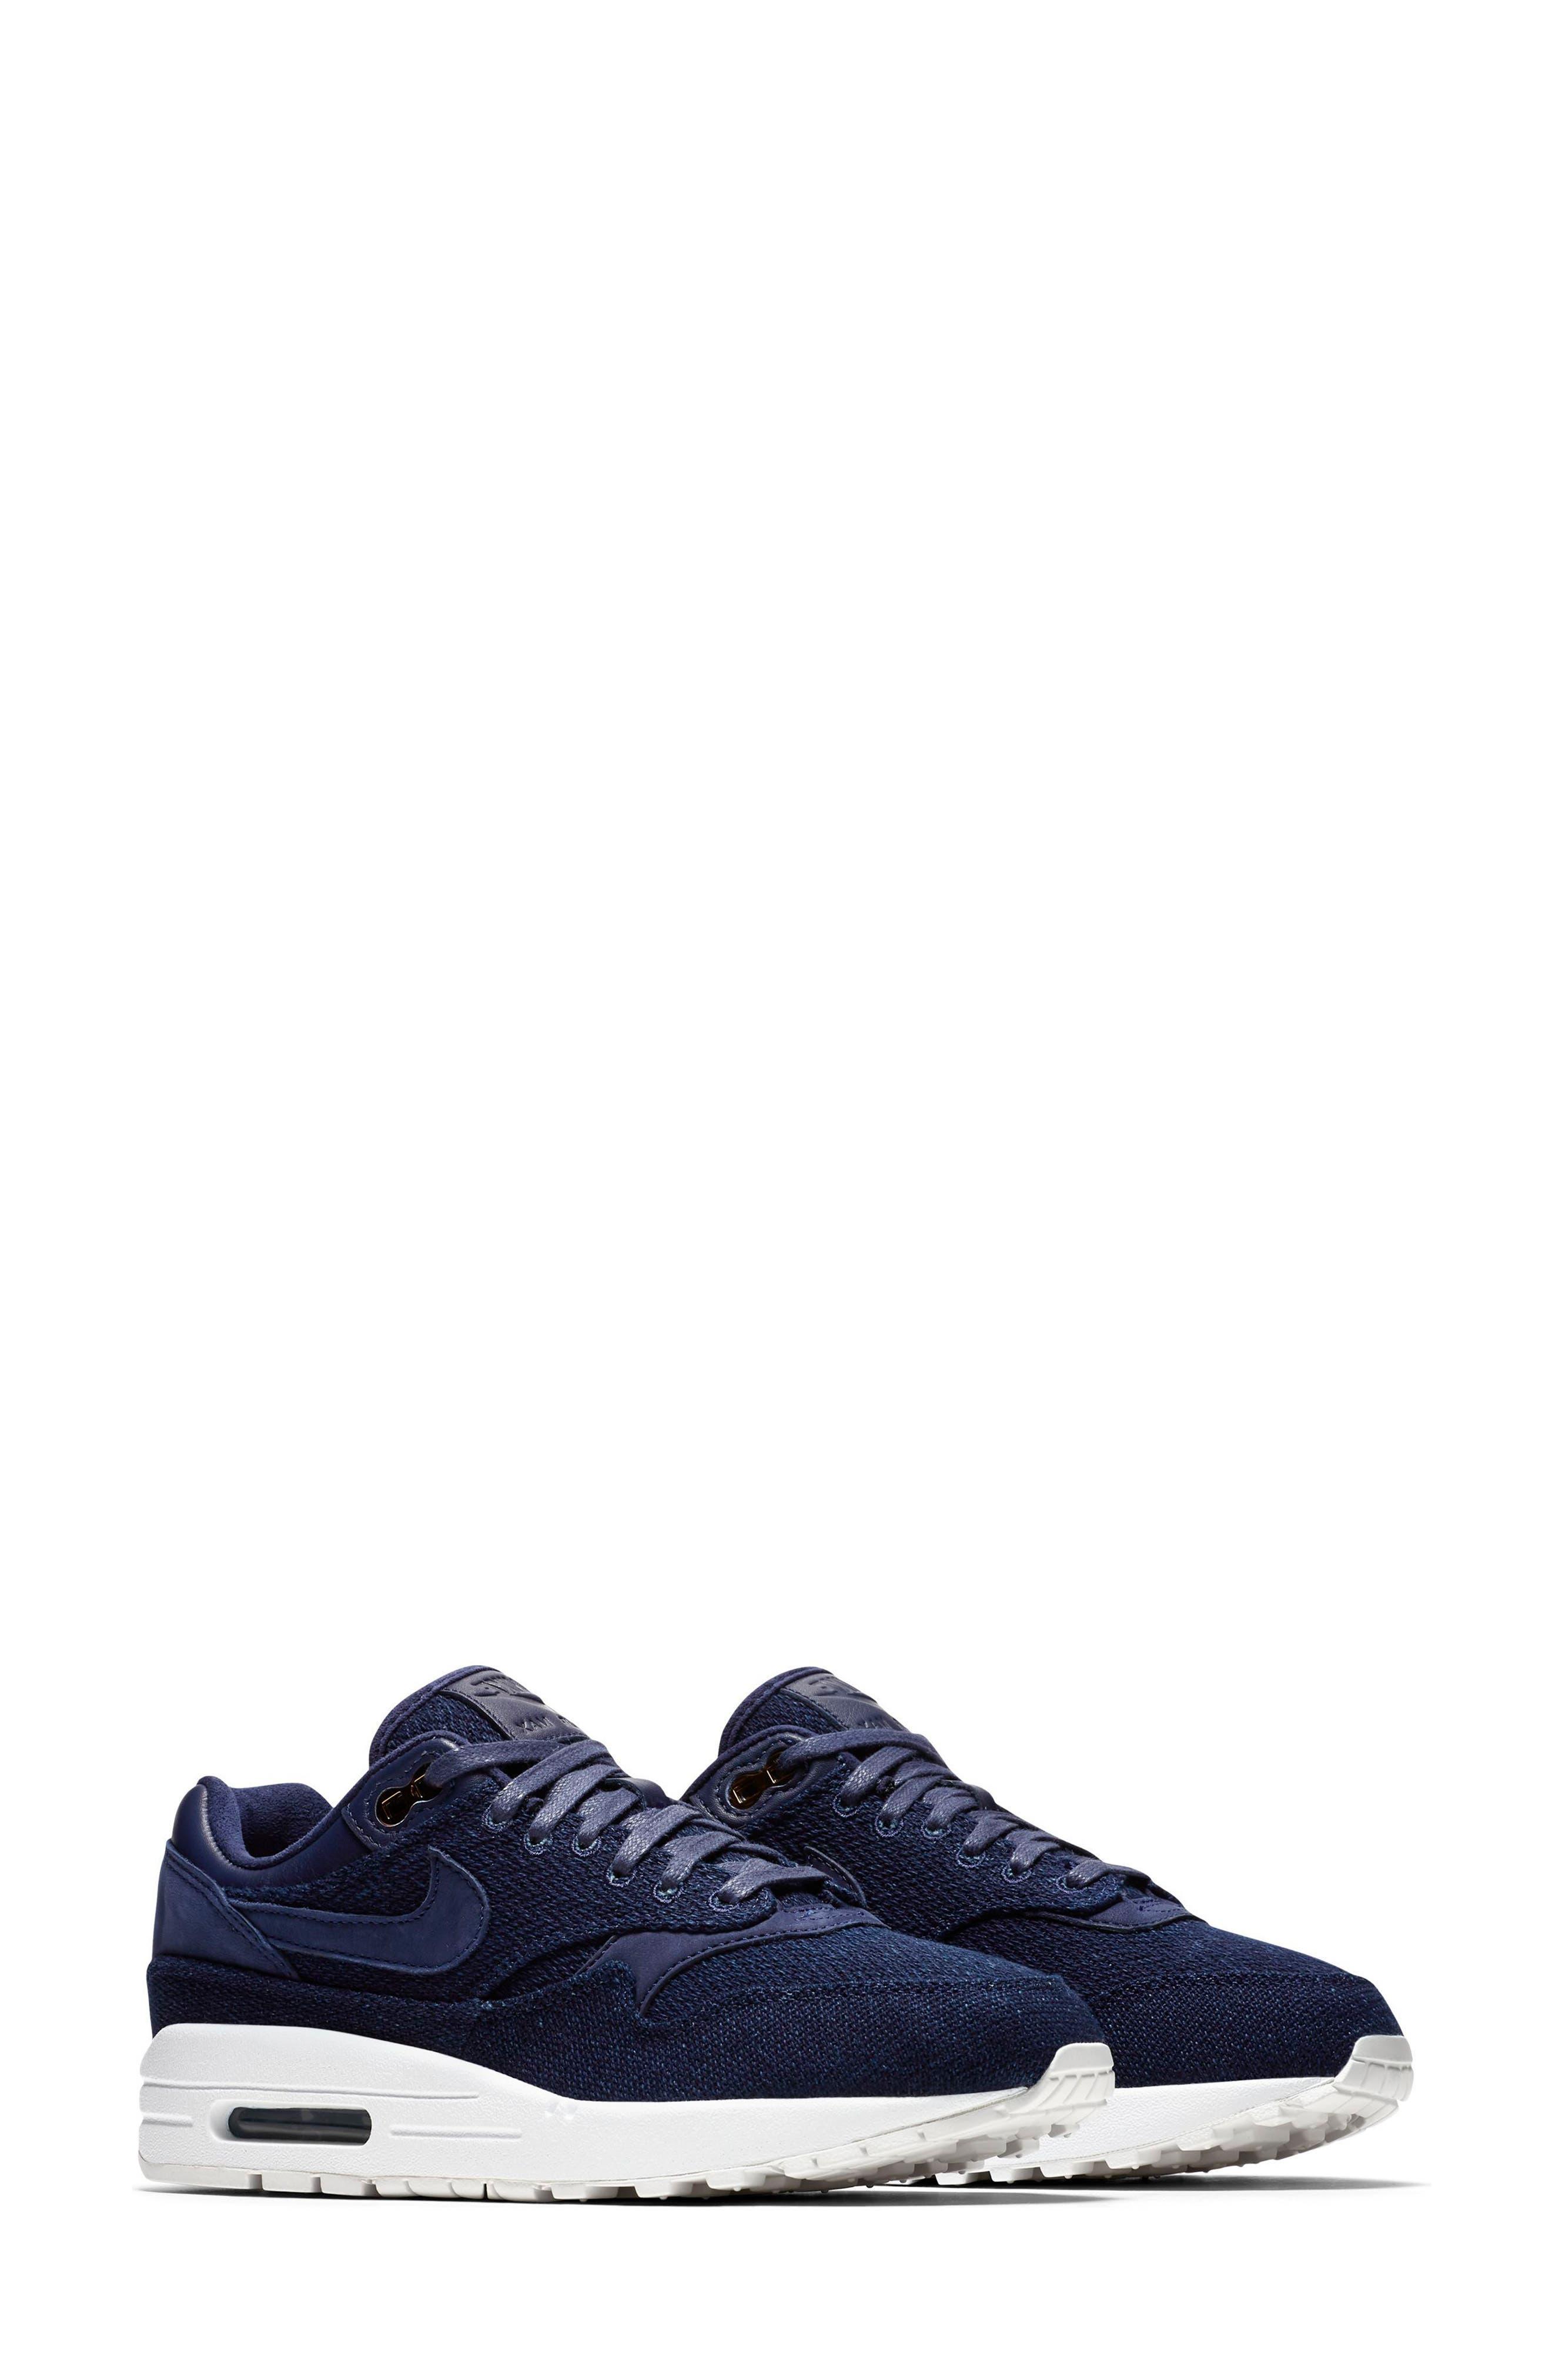 Alternate Image 1 Selected - Nike Air Max 1 Lux Sneaker (Women)